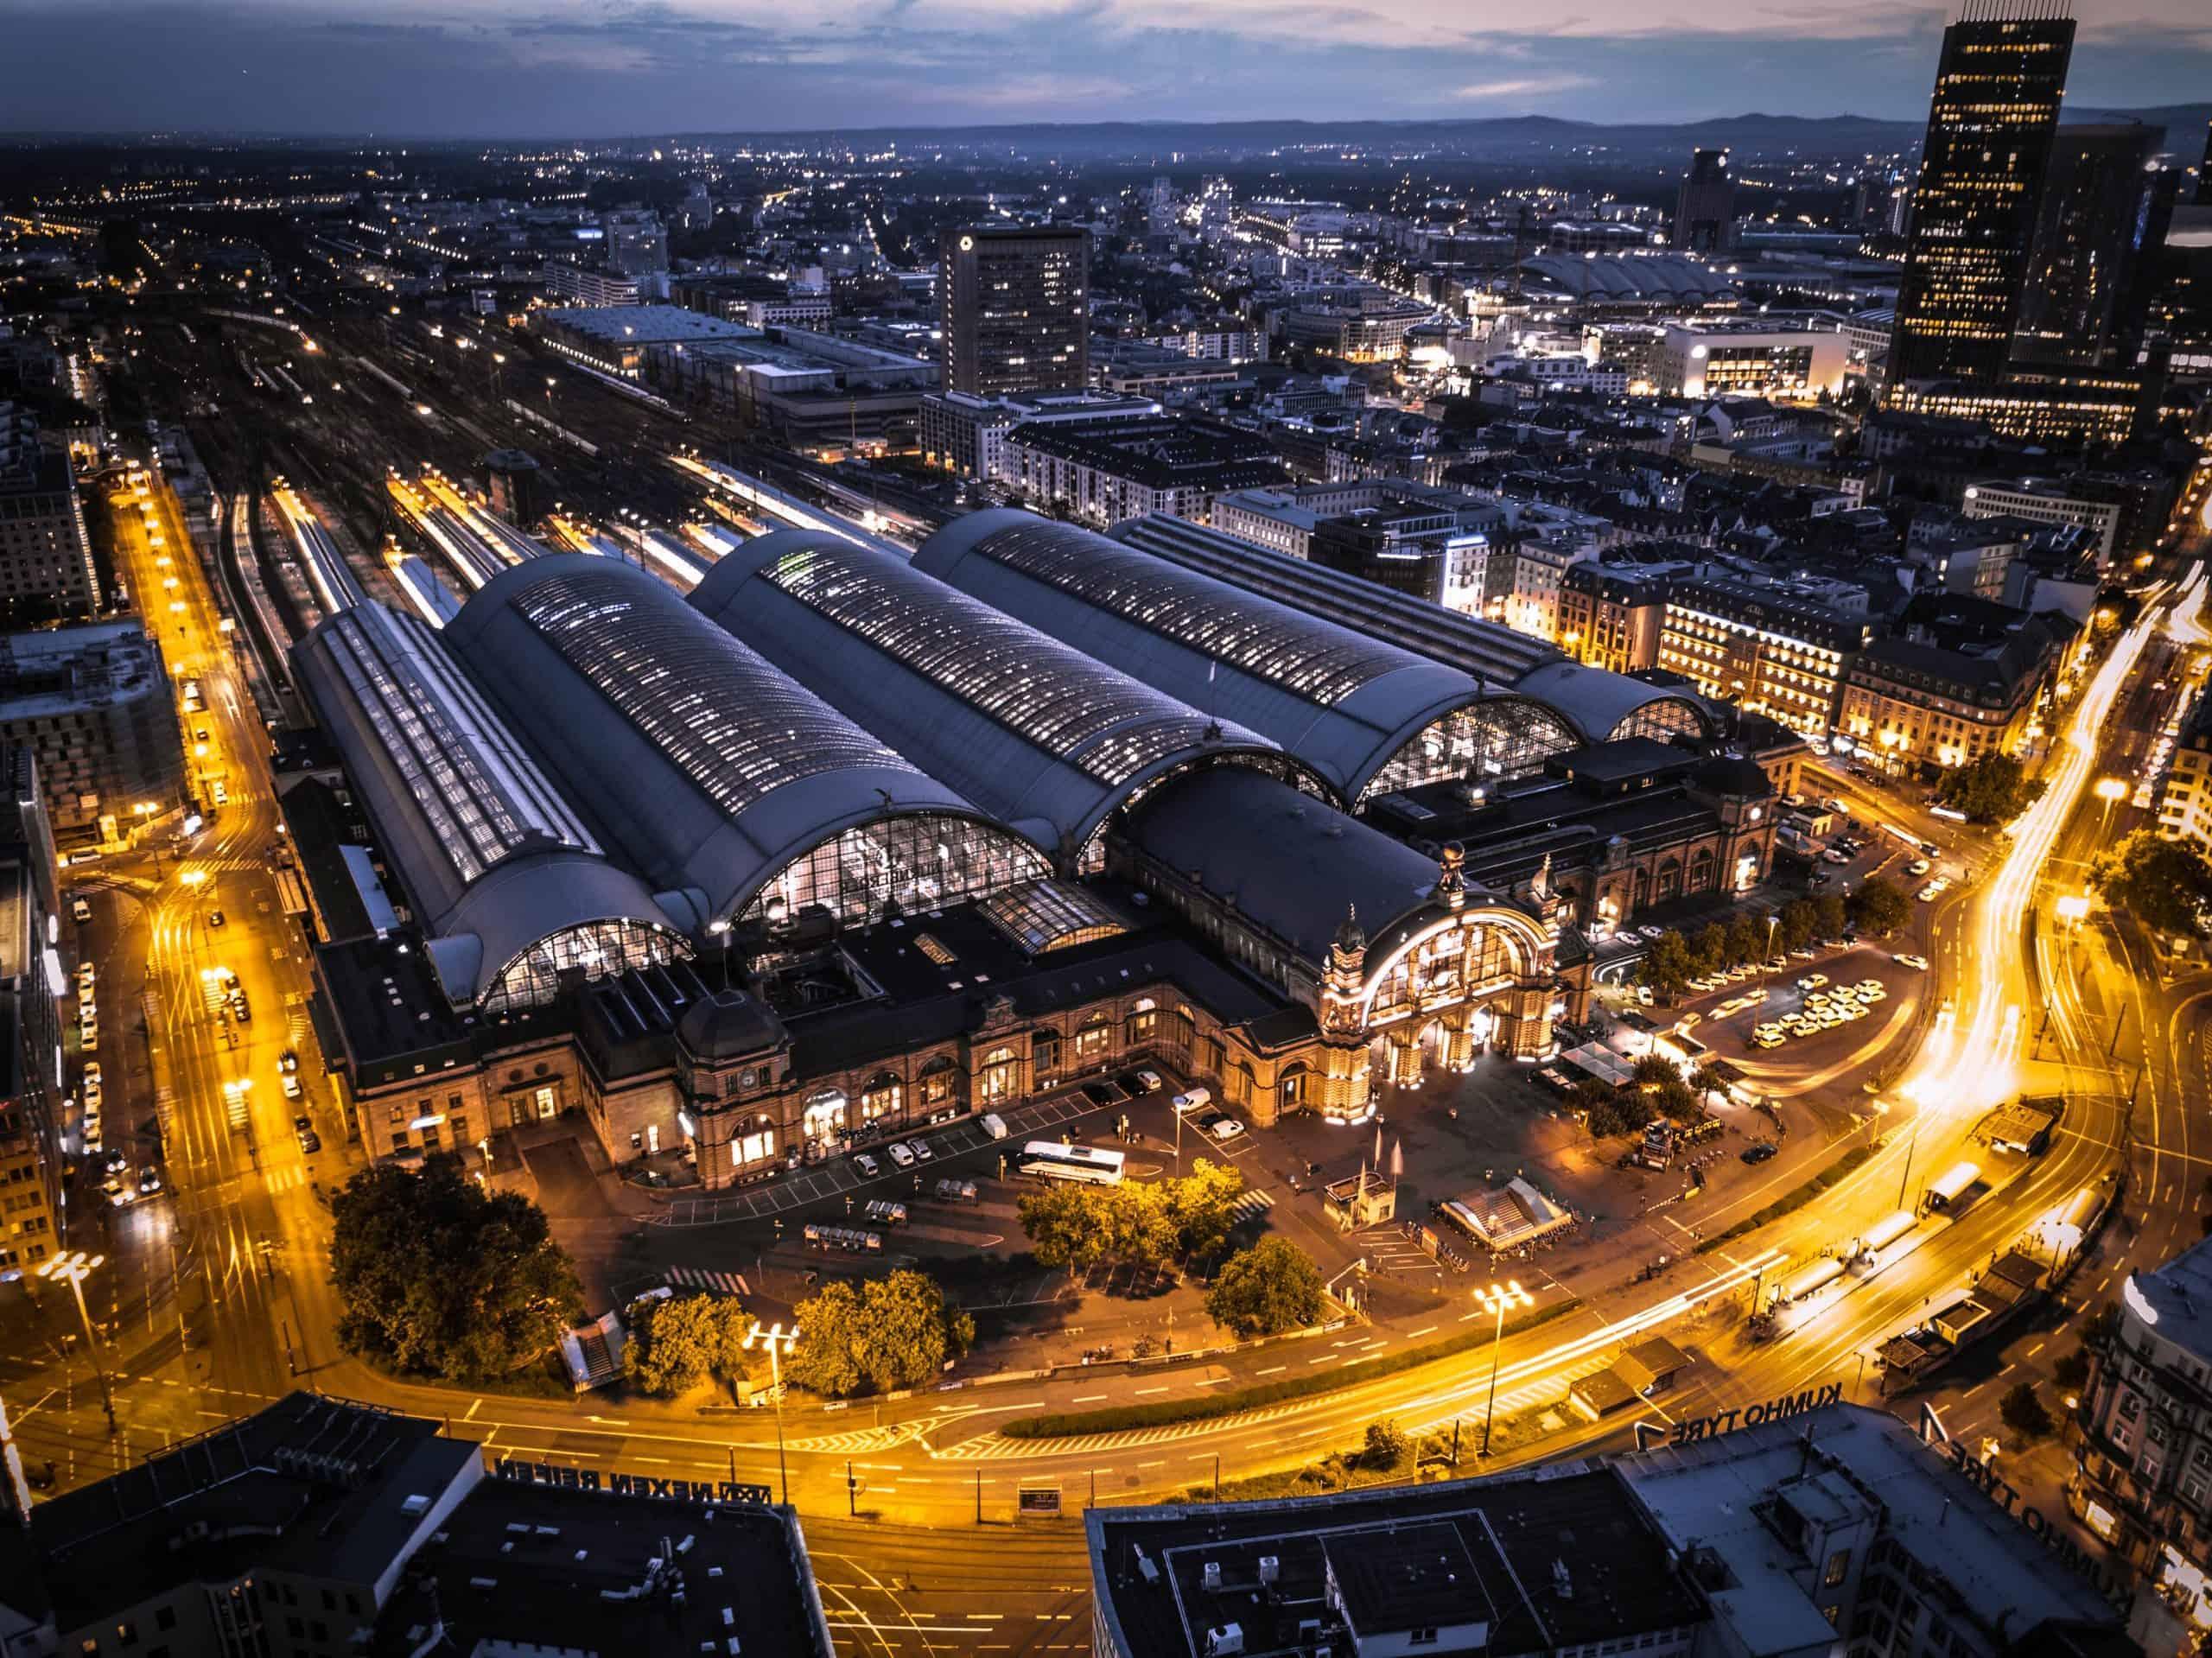 Frankfurter Fondsgesellschaft/Immobilieninvestor kauft Medicus Portfolio